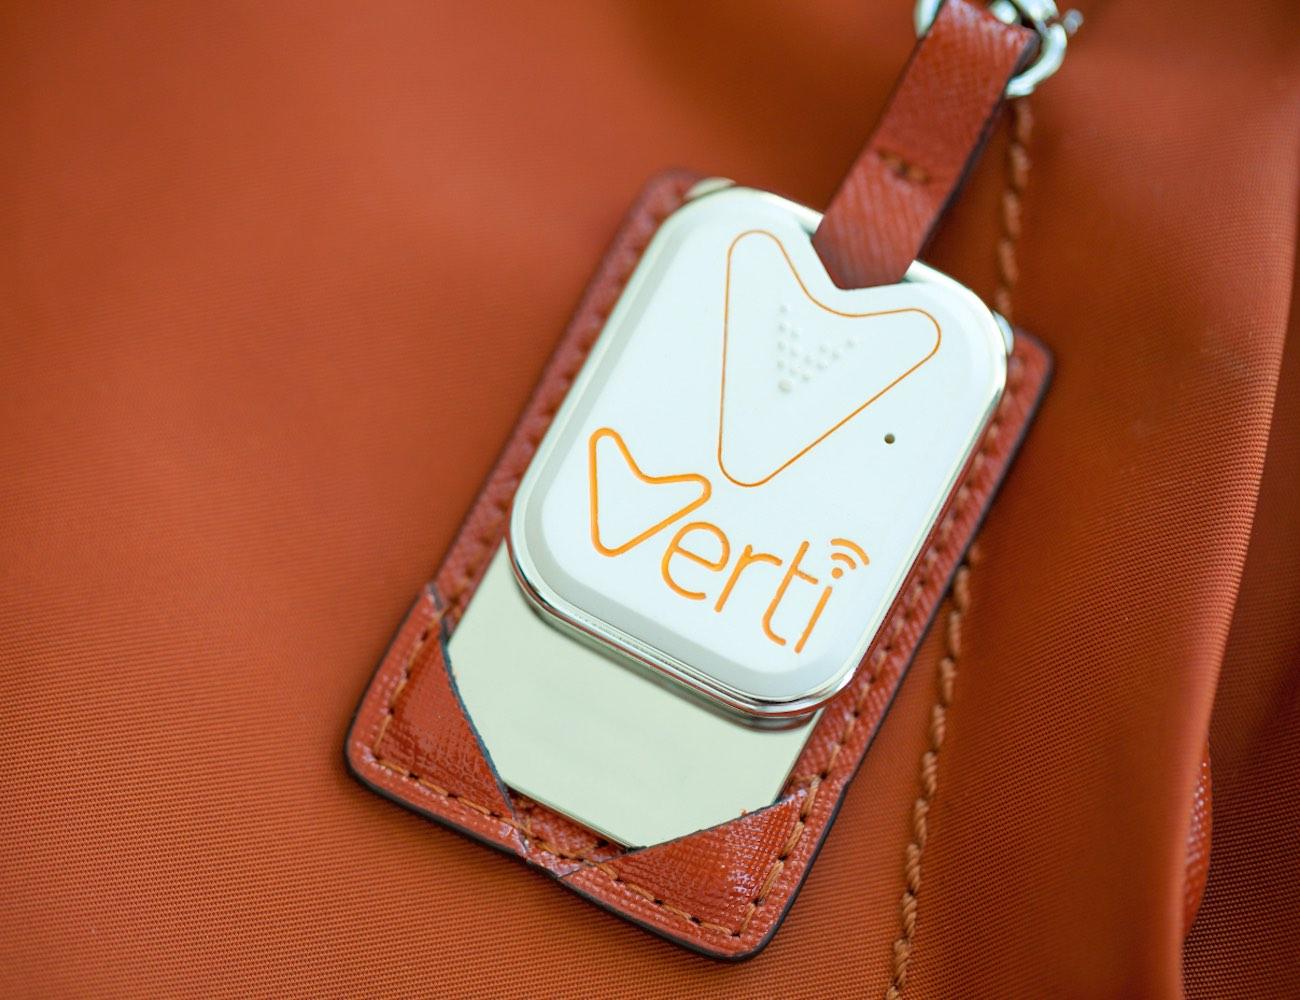 Verti – The Multi-Use Bluetooth Tracker